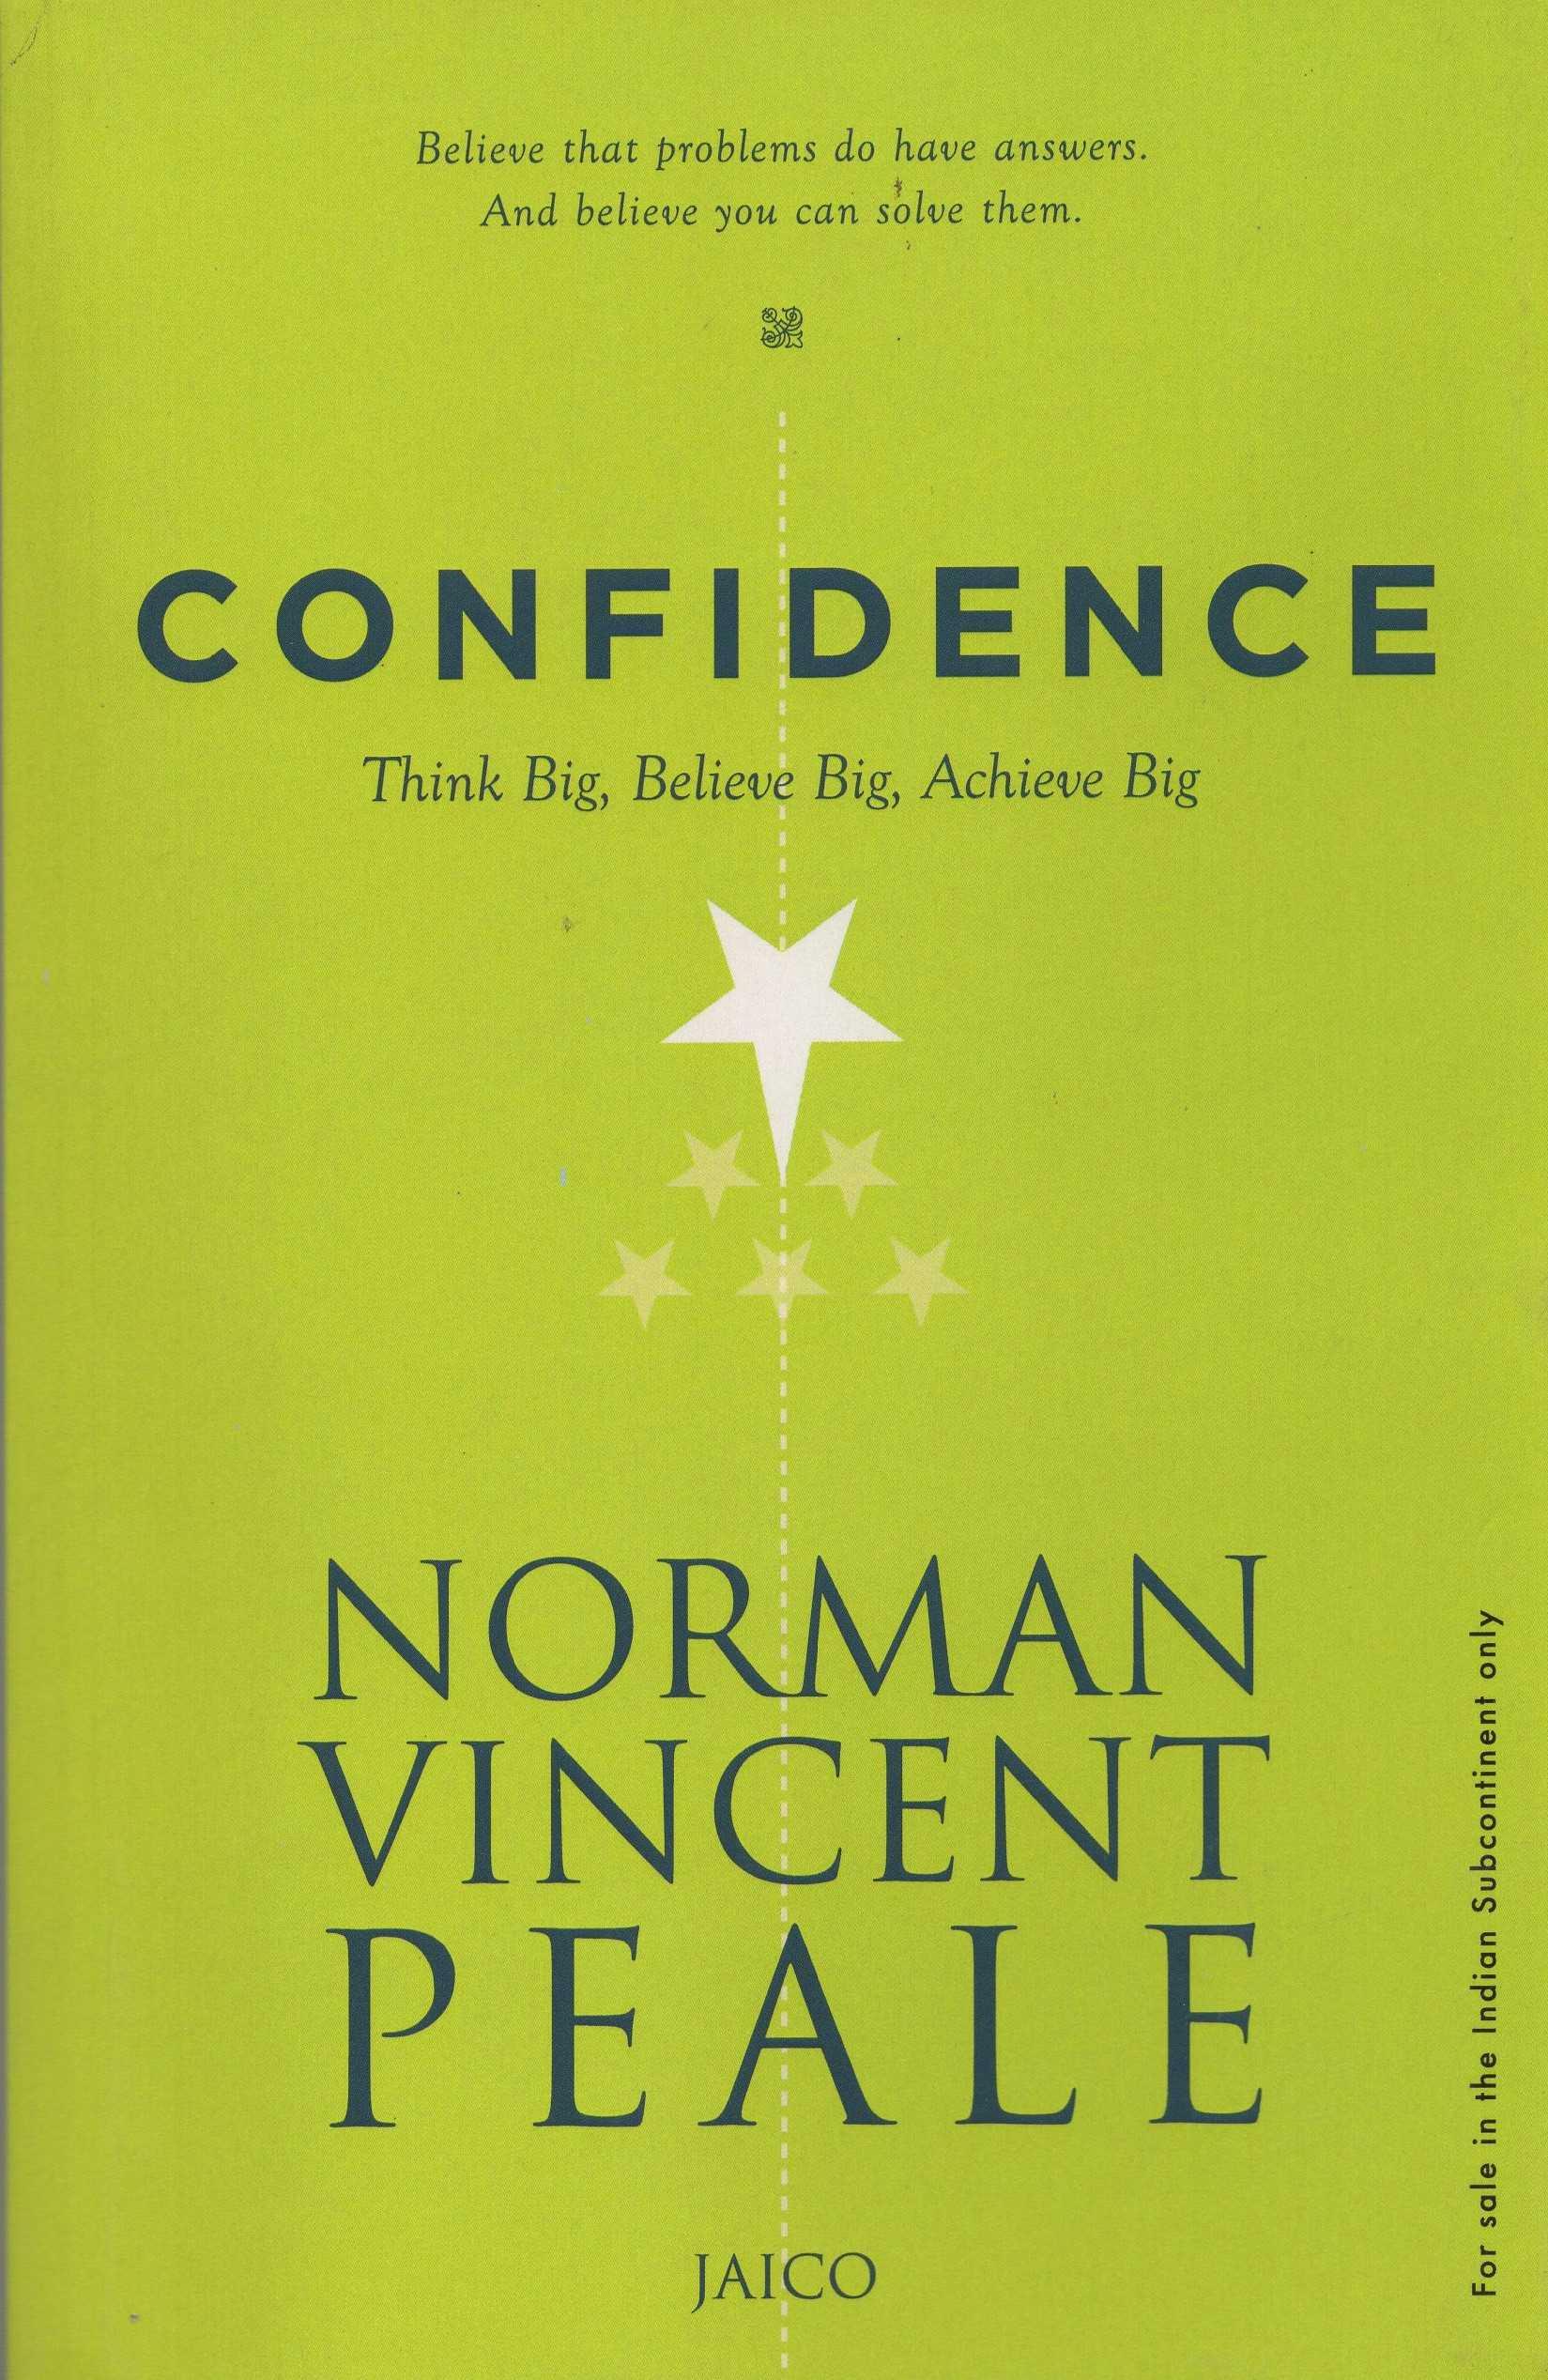 CONFIDENCE (THINK BIG, BELIEVE BIG, ACHIEVE BIG)